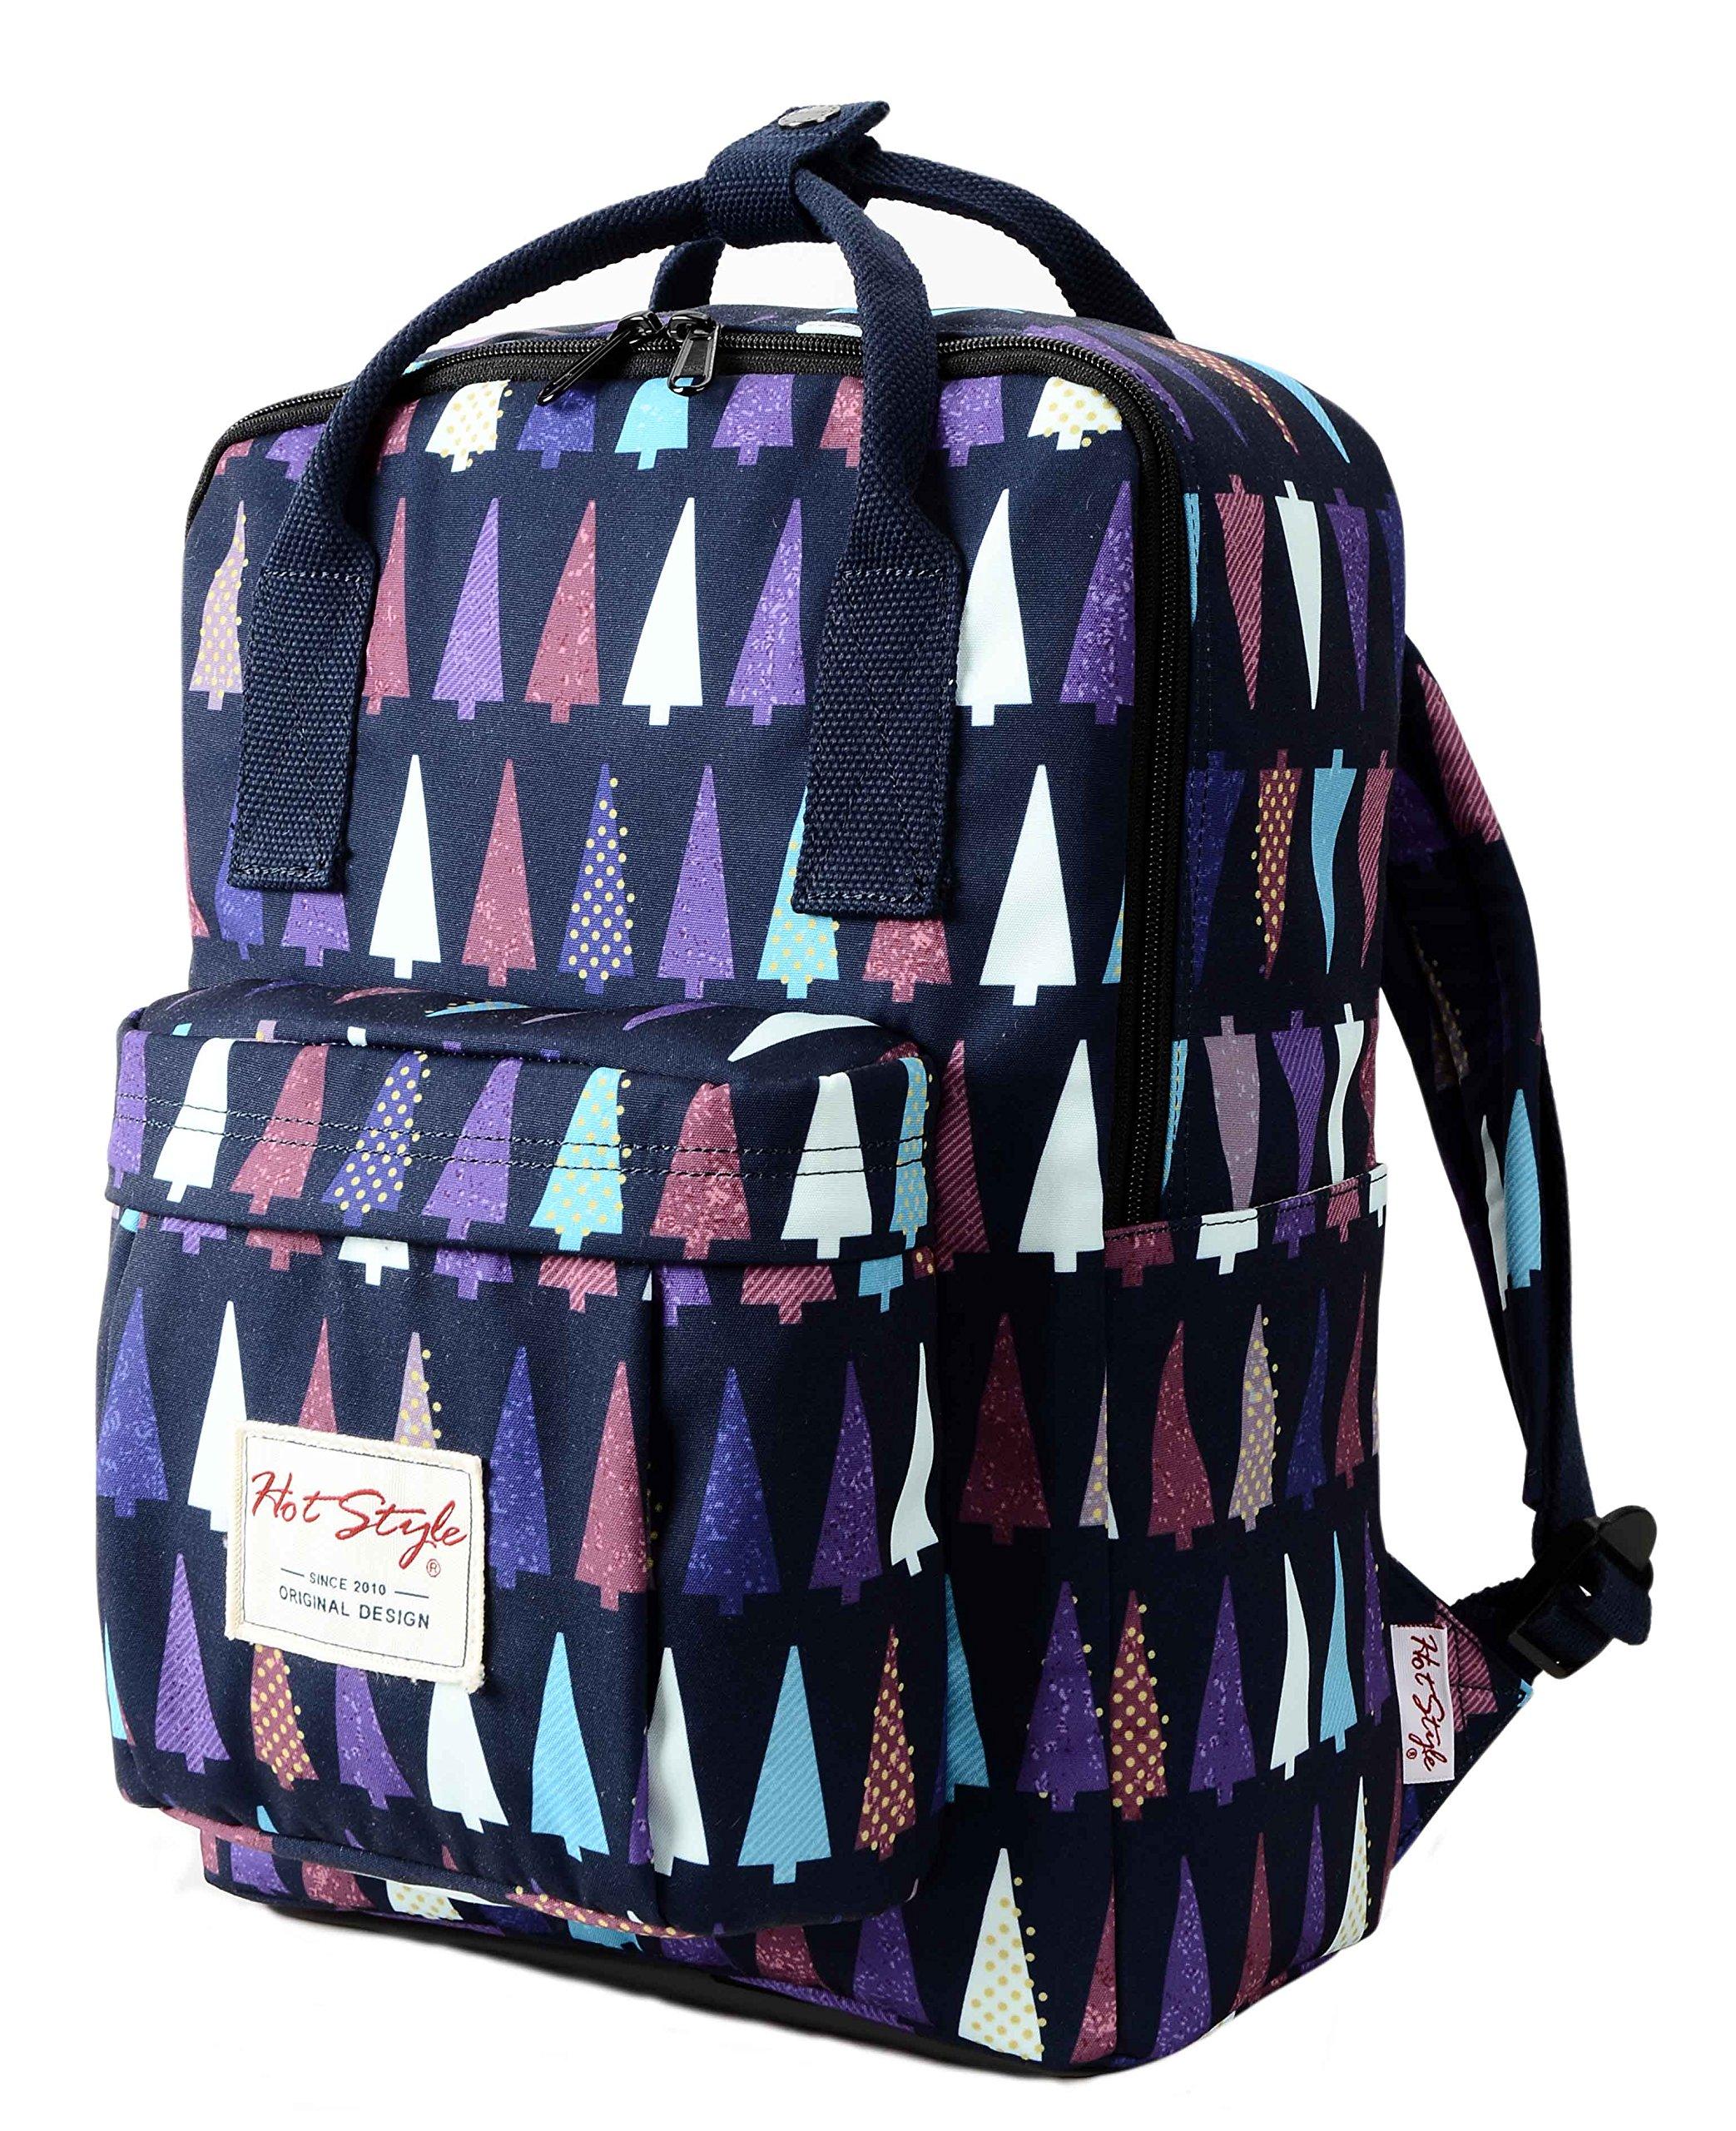 HotStyle BESTIE Cute School Backpack for Girls - Christmas Trees